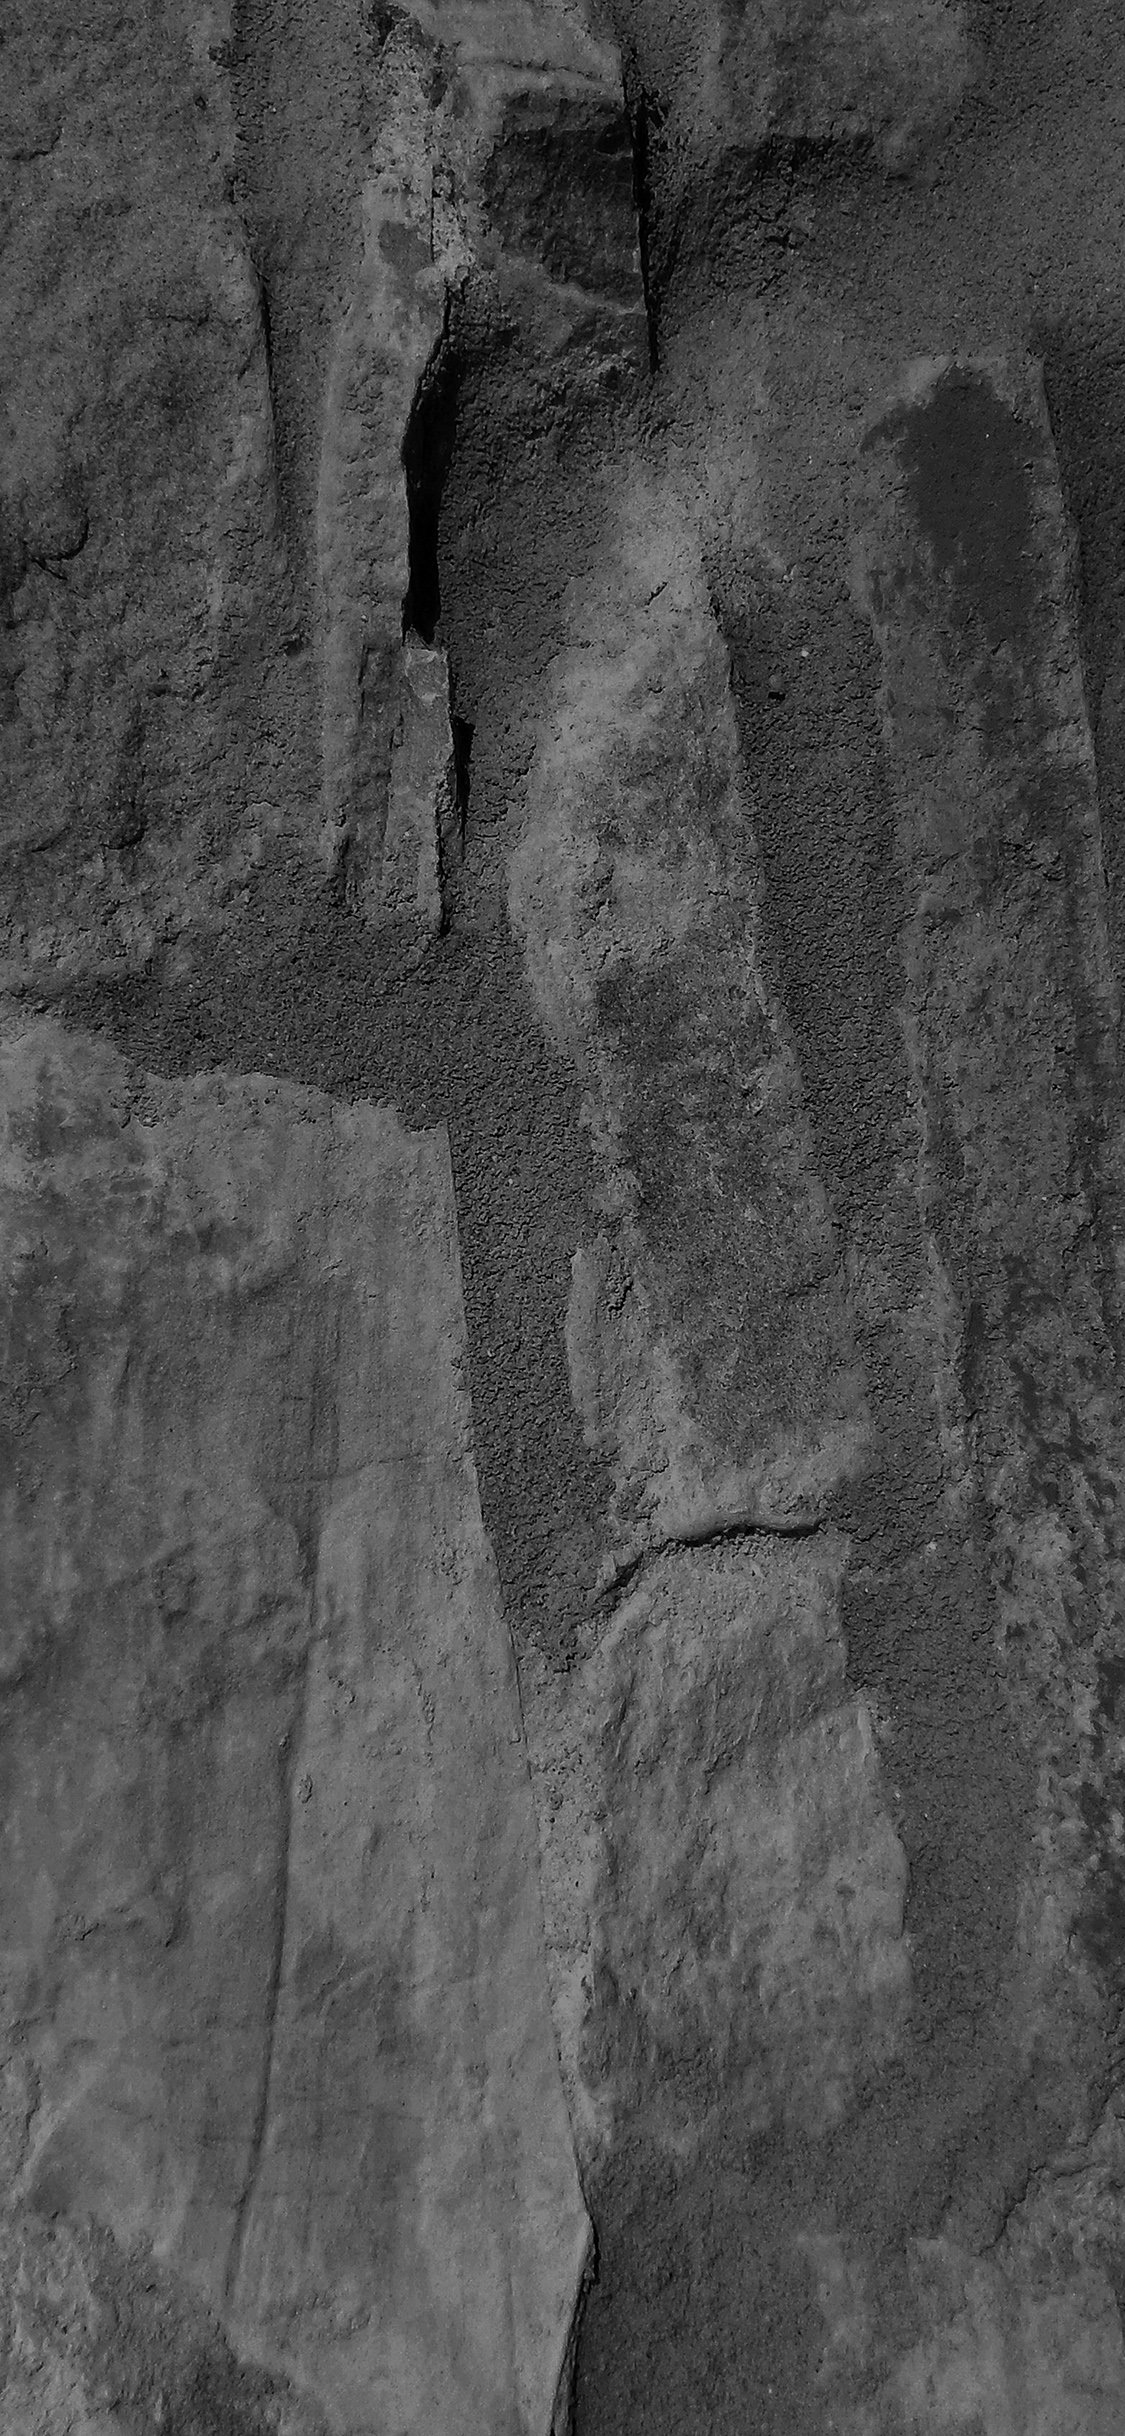 Brick Wall Texture Pattern Dark Iphone X Wallpapers Free